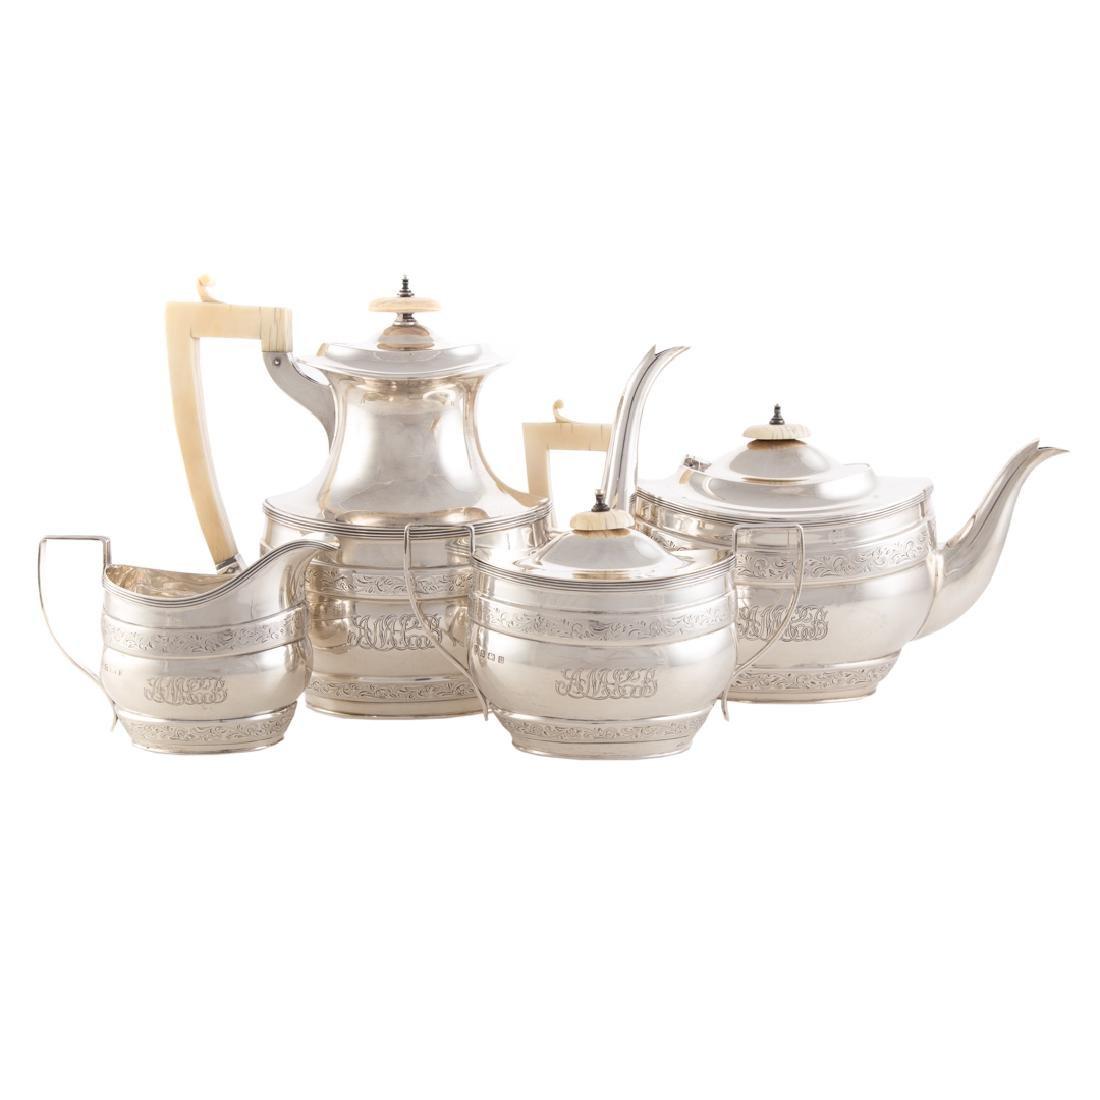 George V sterling 4-pc coffee & tea service